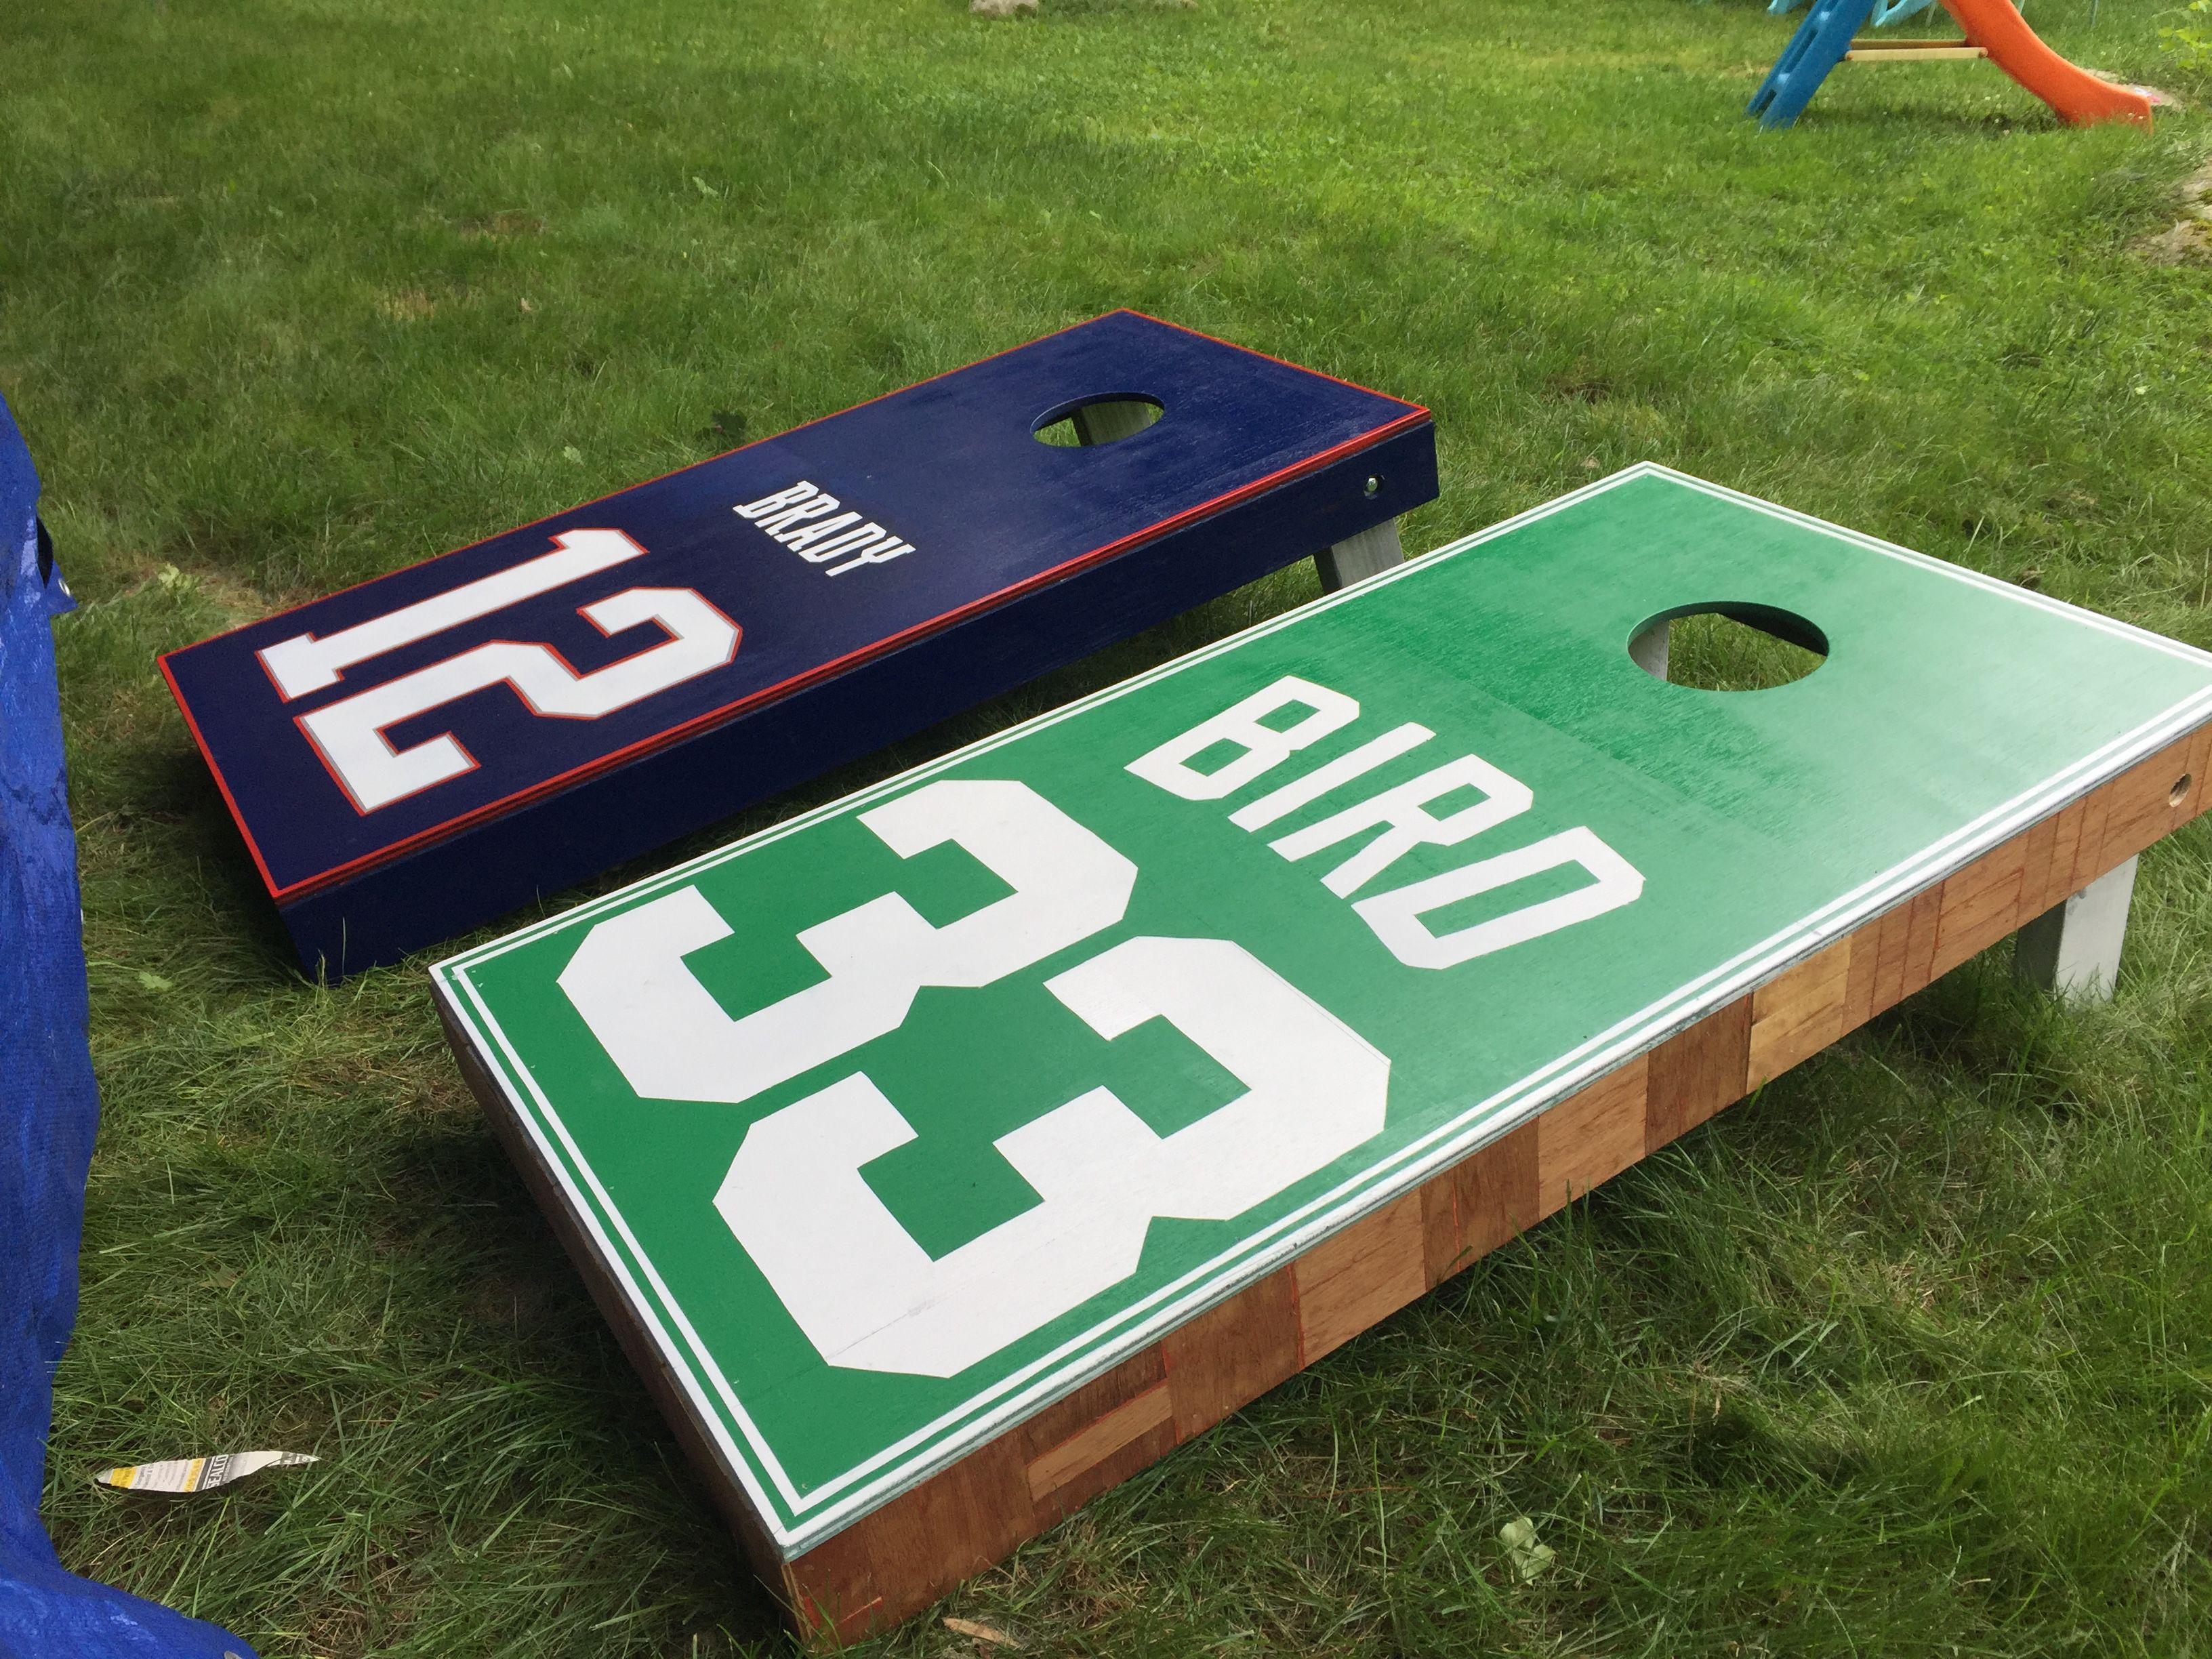 Cornhole Boards Celtics With Parquet Floor Trim Floor Trim Parquet Flooring Cornhole Boards